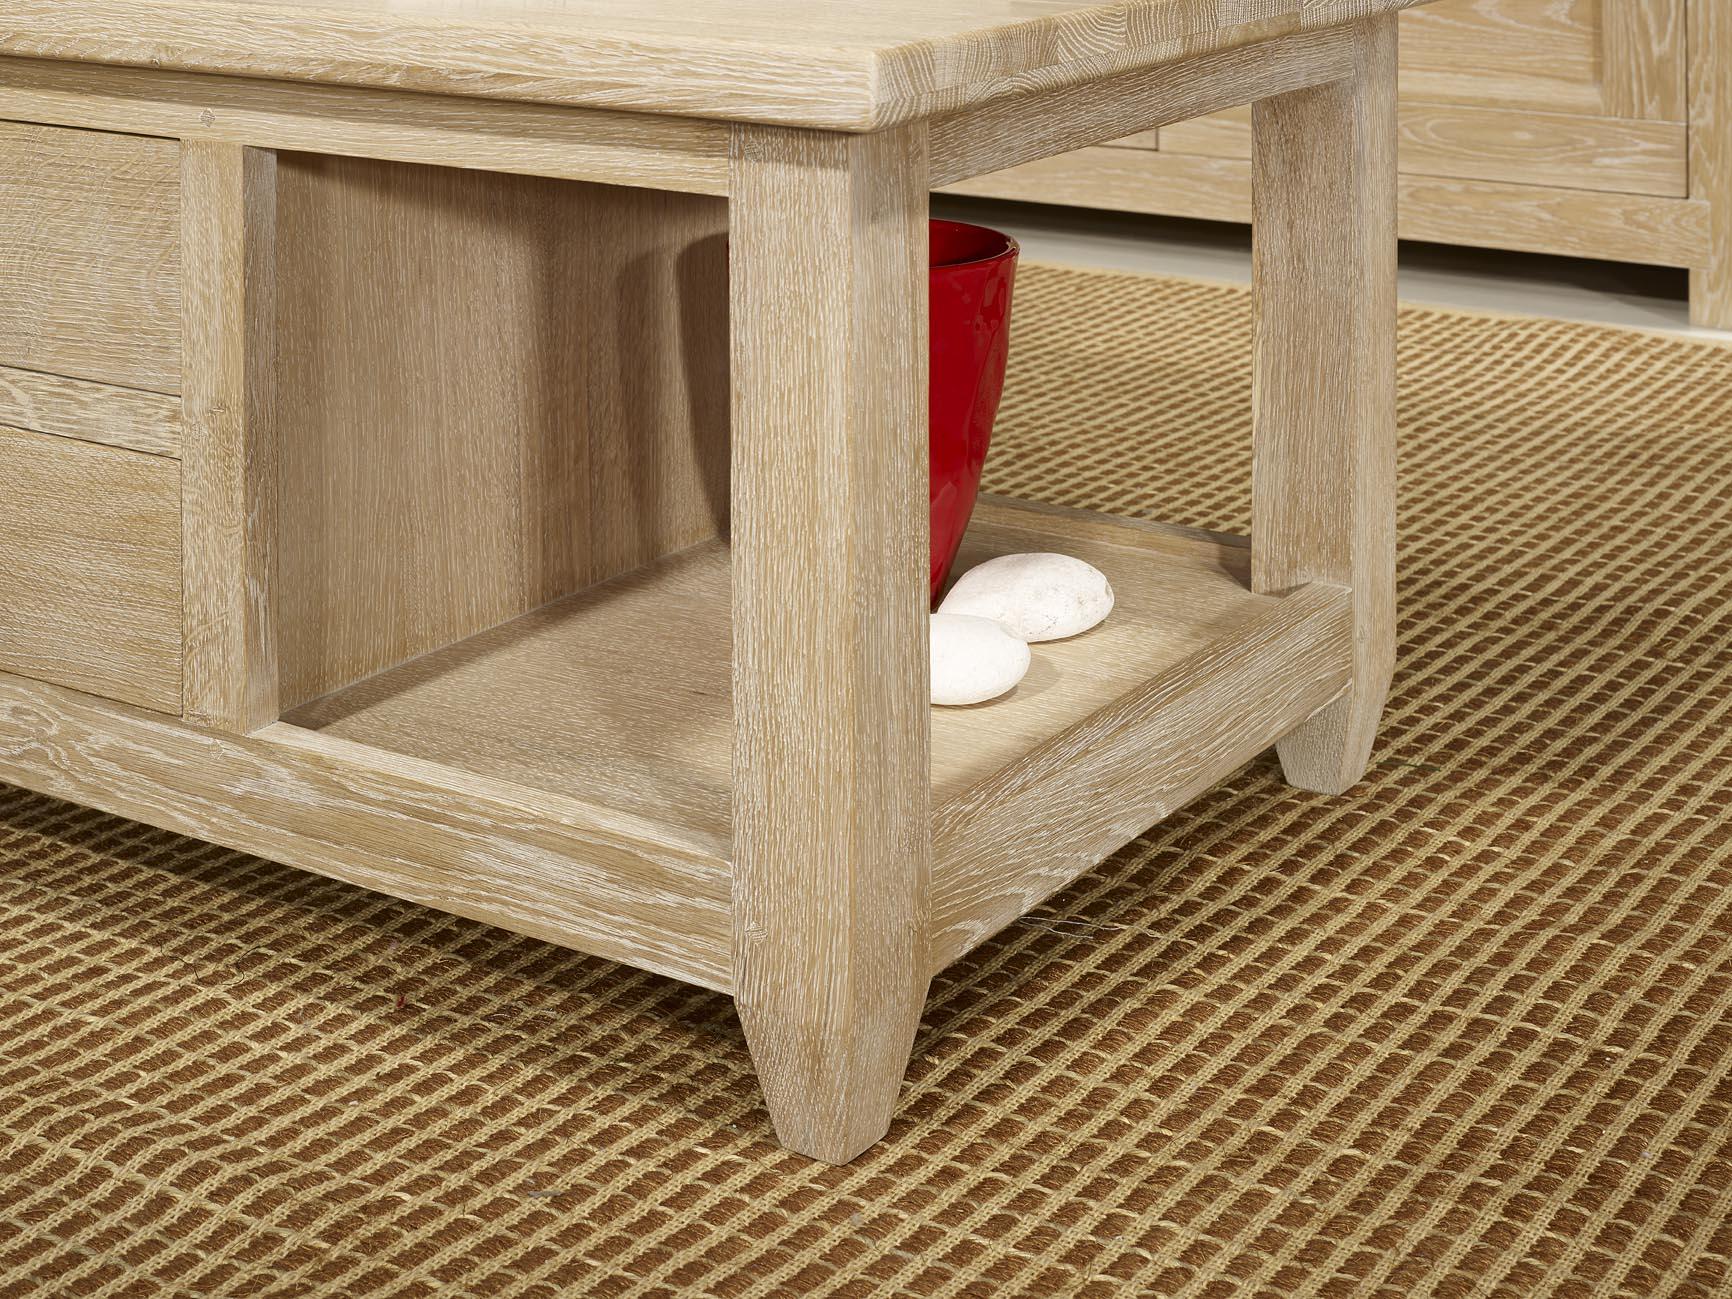 Table basse thomas en ch ne massif de style campagnard - Table chene massif blanchi ...